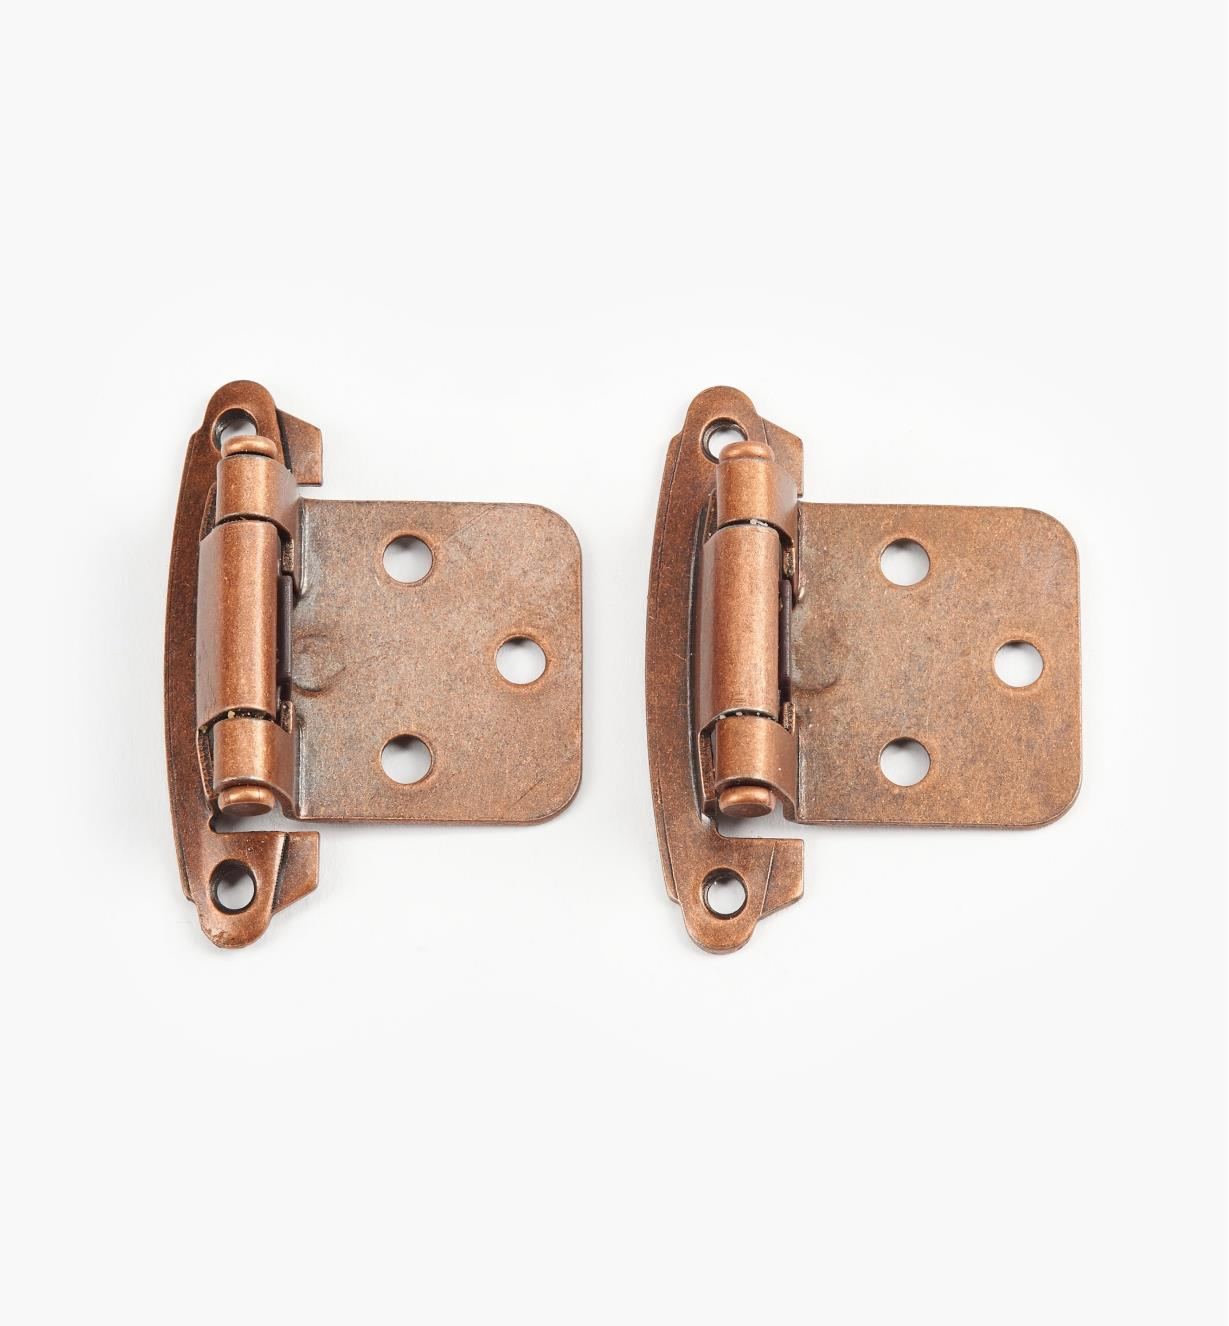 99X0171 - Belwith Self-Closing Flush-Mount Hinges, Antique-Copper, pkg. of 10 pairs